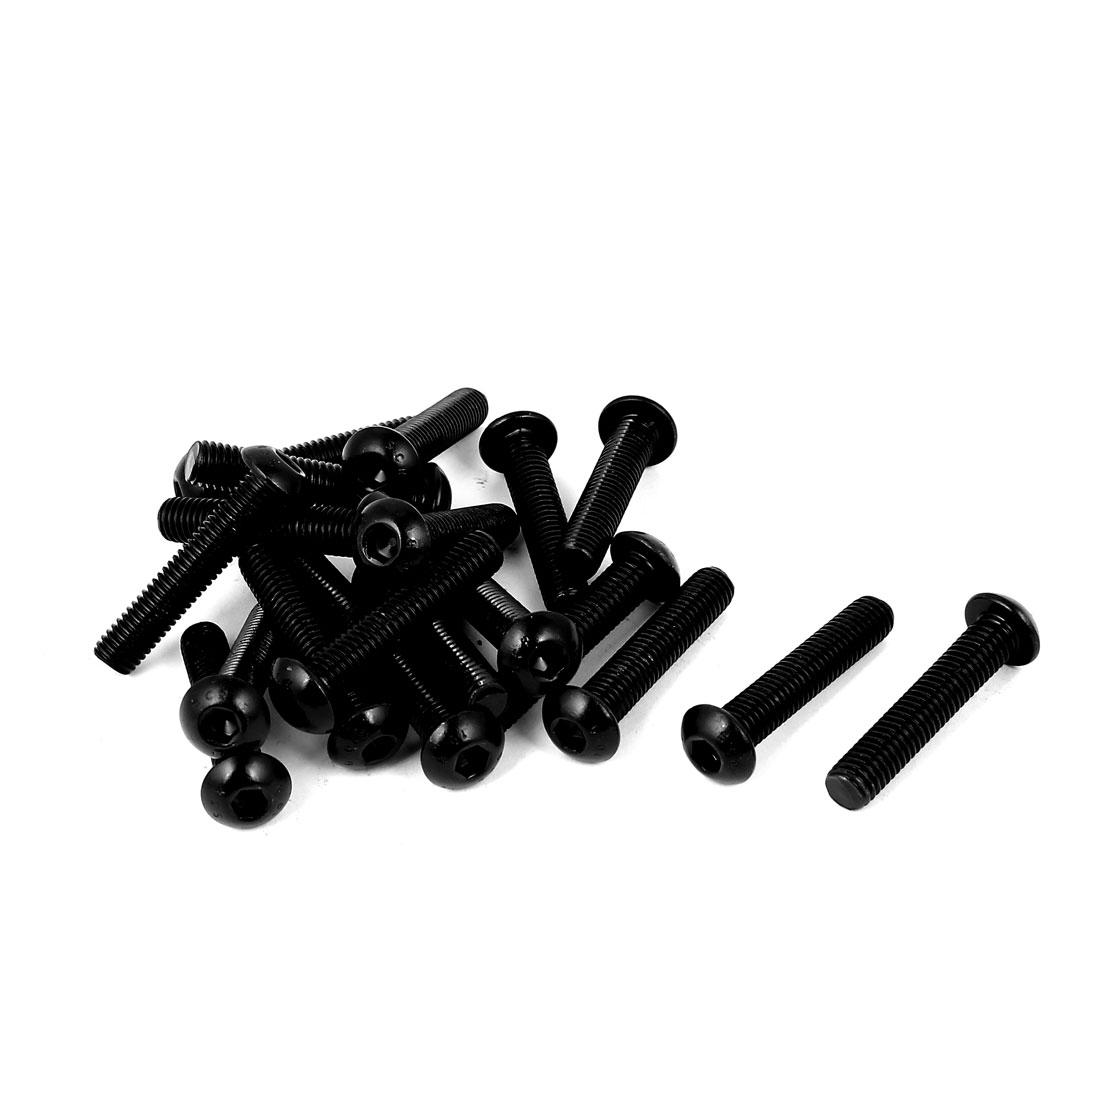 M8x40mm 10.9 Alloy Steel Button Head Hex Socket Cap Screw Bolt Black 20pcs